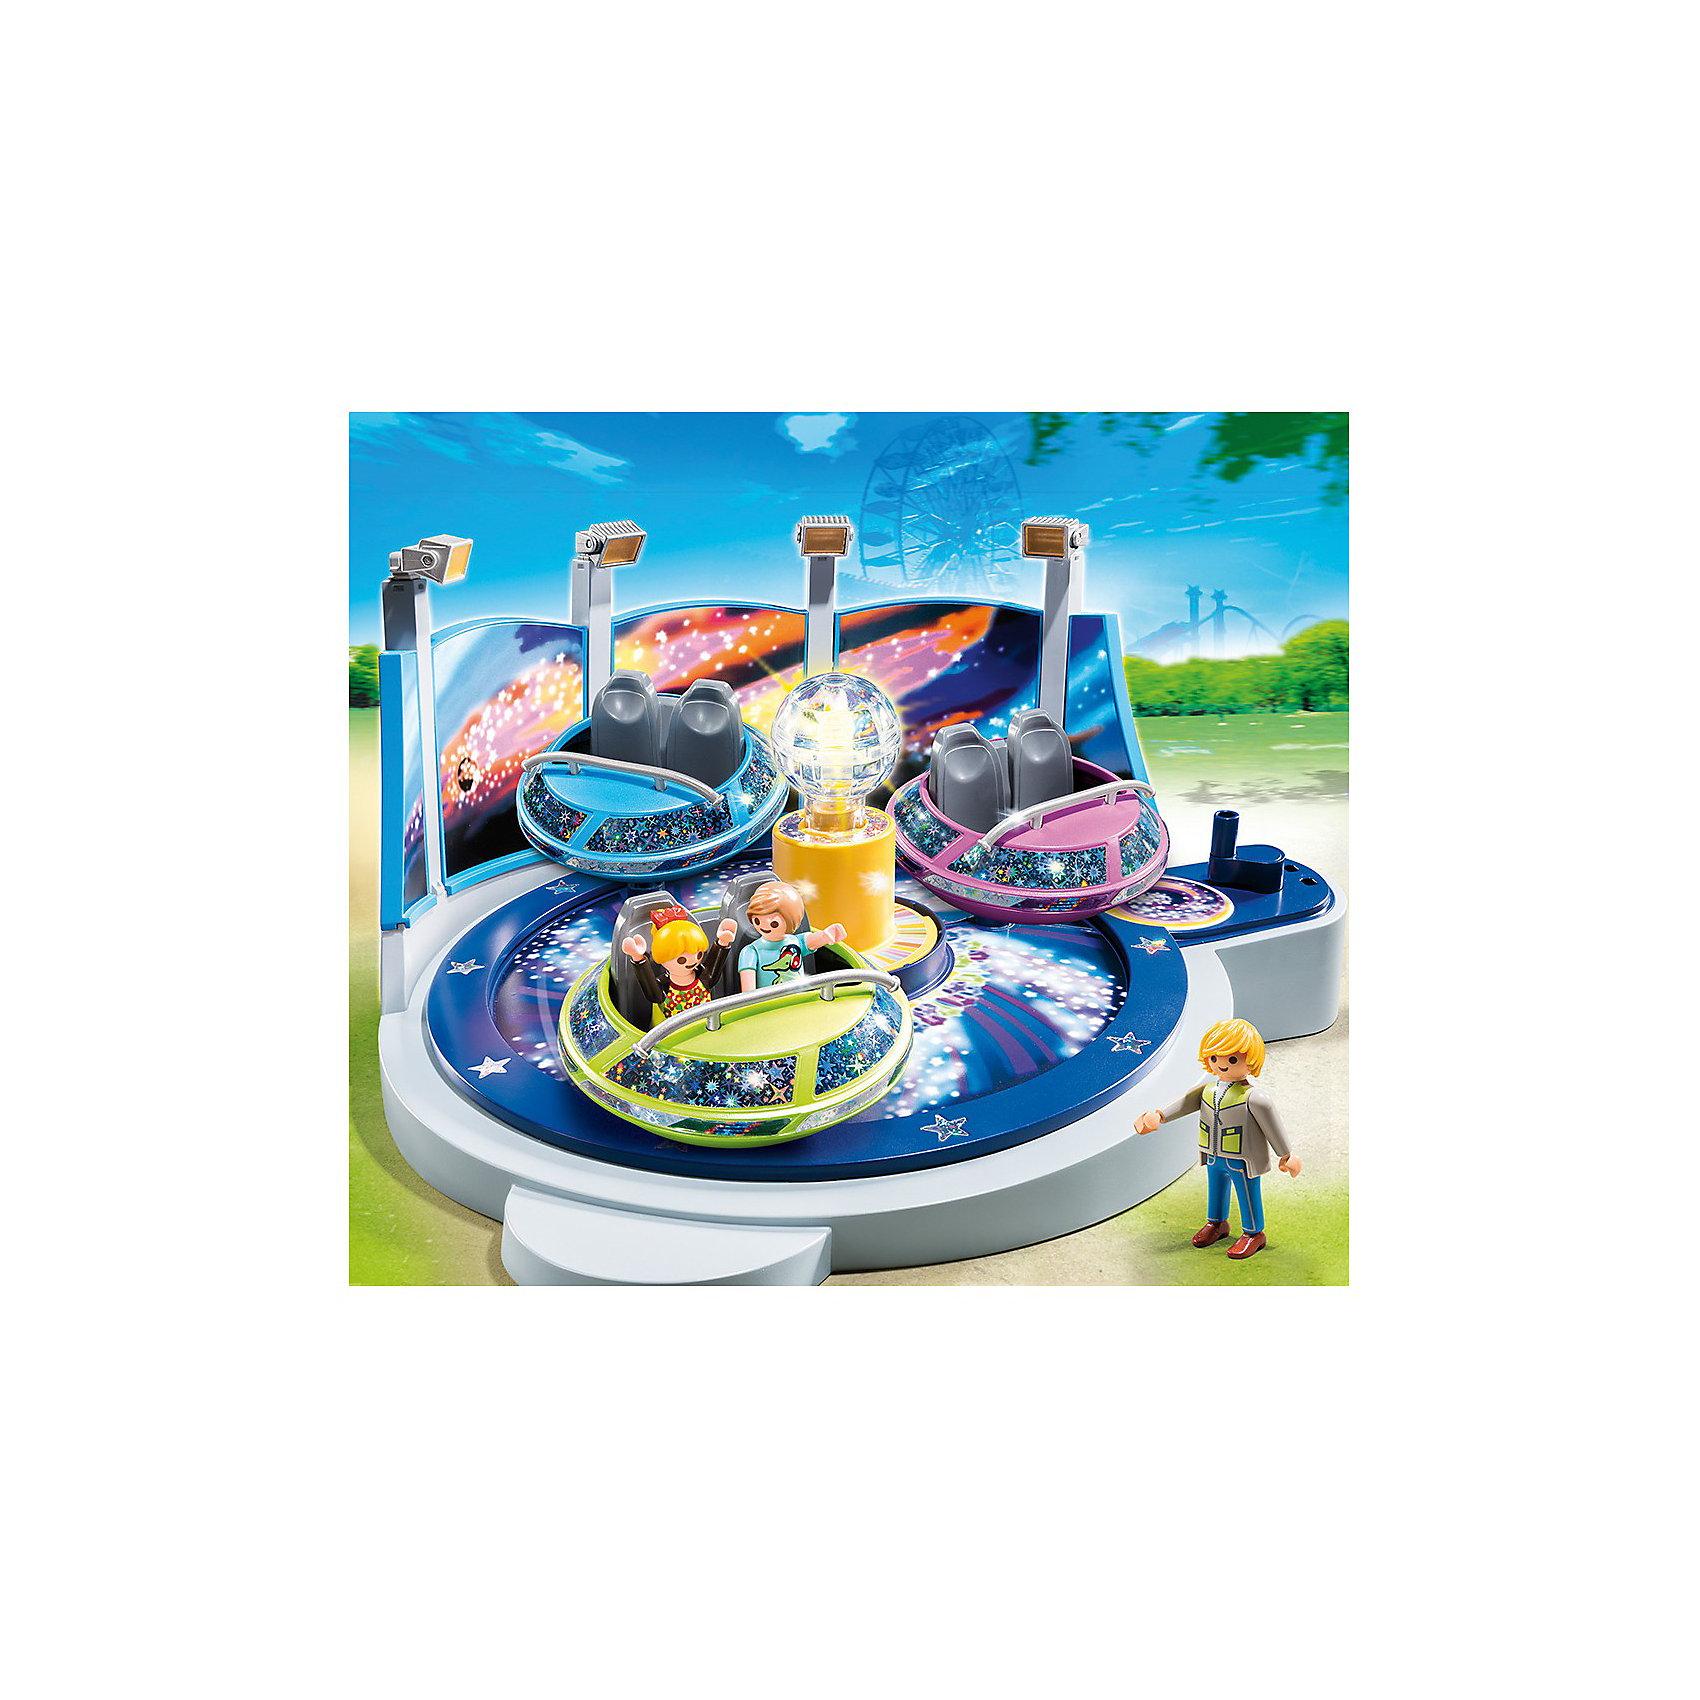 PLAYMOBIL® PLAYMOBIL 5554 Парк Развлечений: Аттракцион Звездолет с огнями playmobil® playmobil 5546 парк развлечений продавец шаров smileyworld